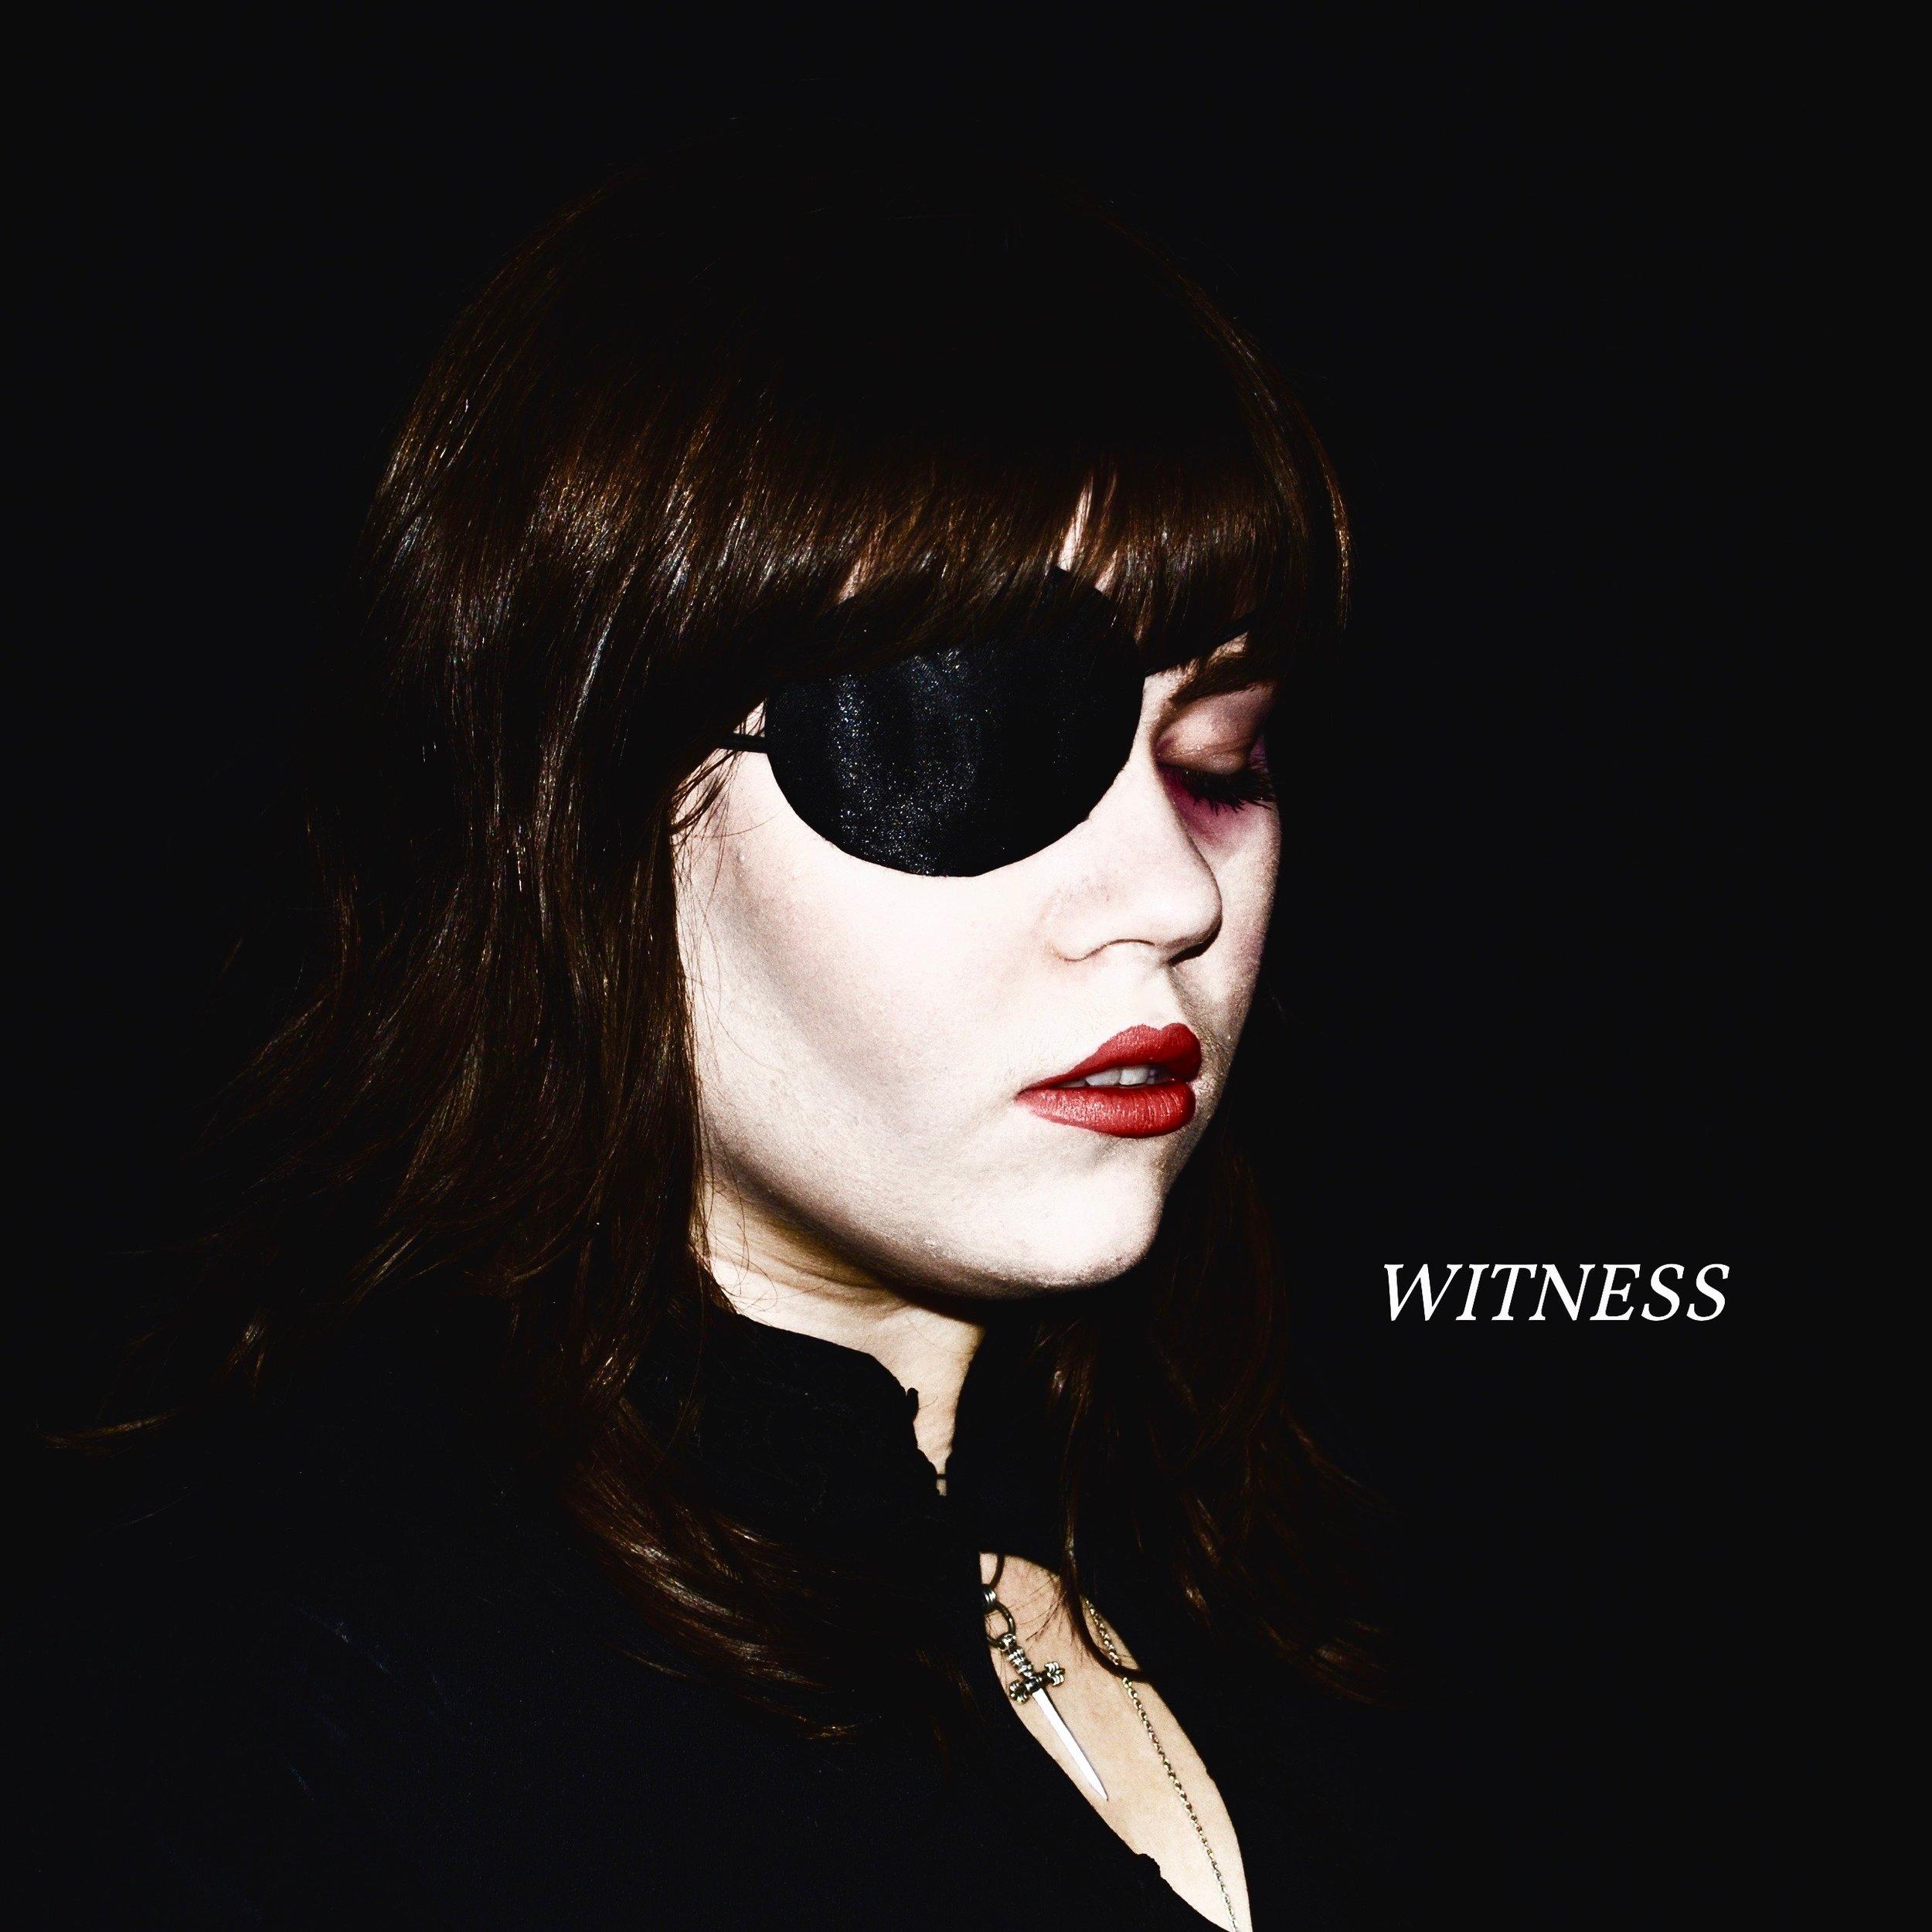 Little Coyote - EHR035 Witness (digital single) / March 1st 2019BUY